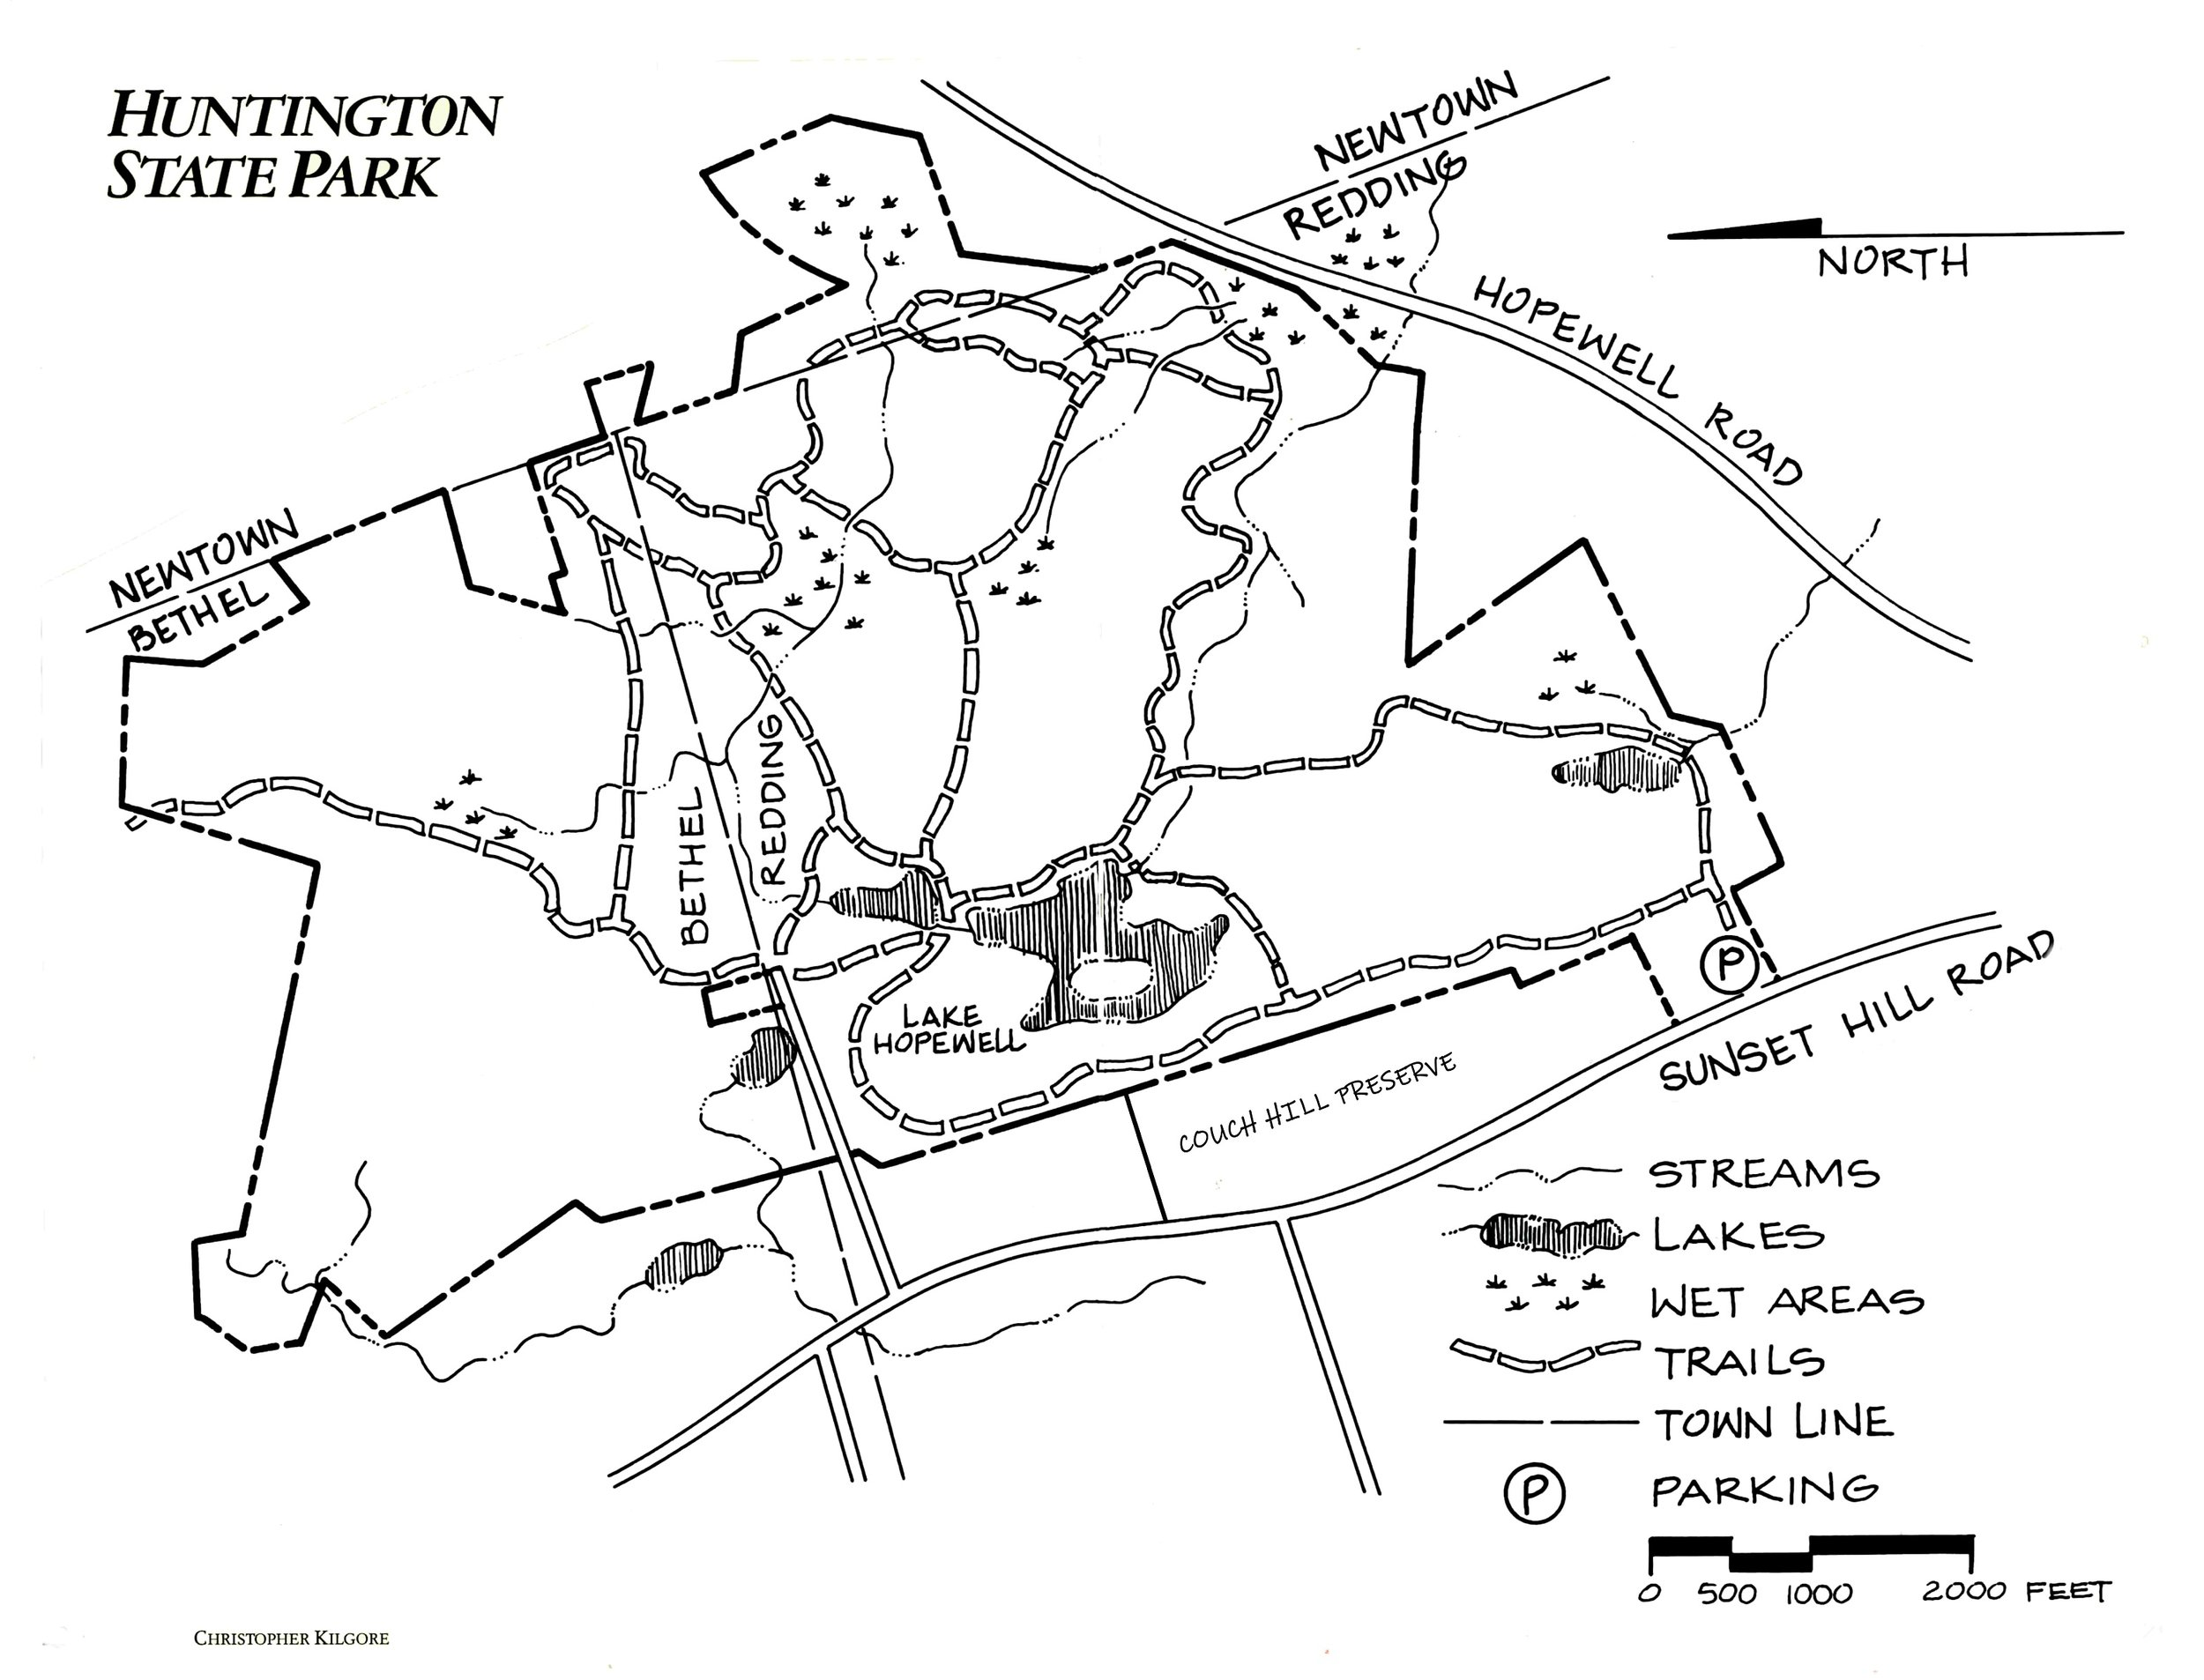 bot-map-huntington2.jpg